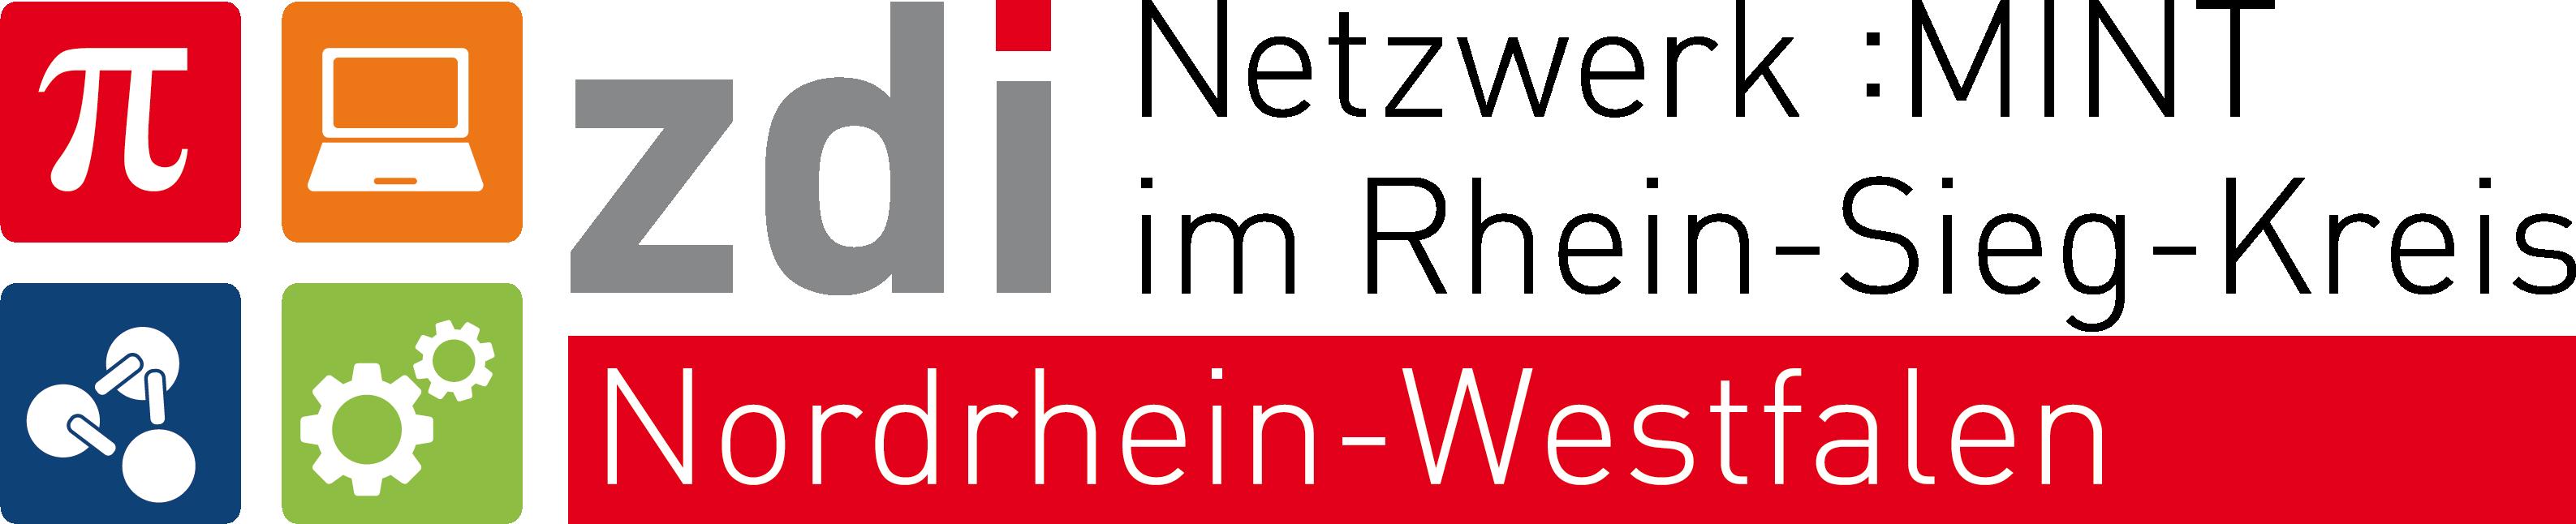 zdi-Netzwerk :MINT im Rhein-Sieg-Kreis